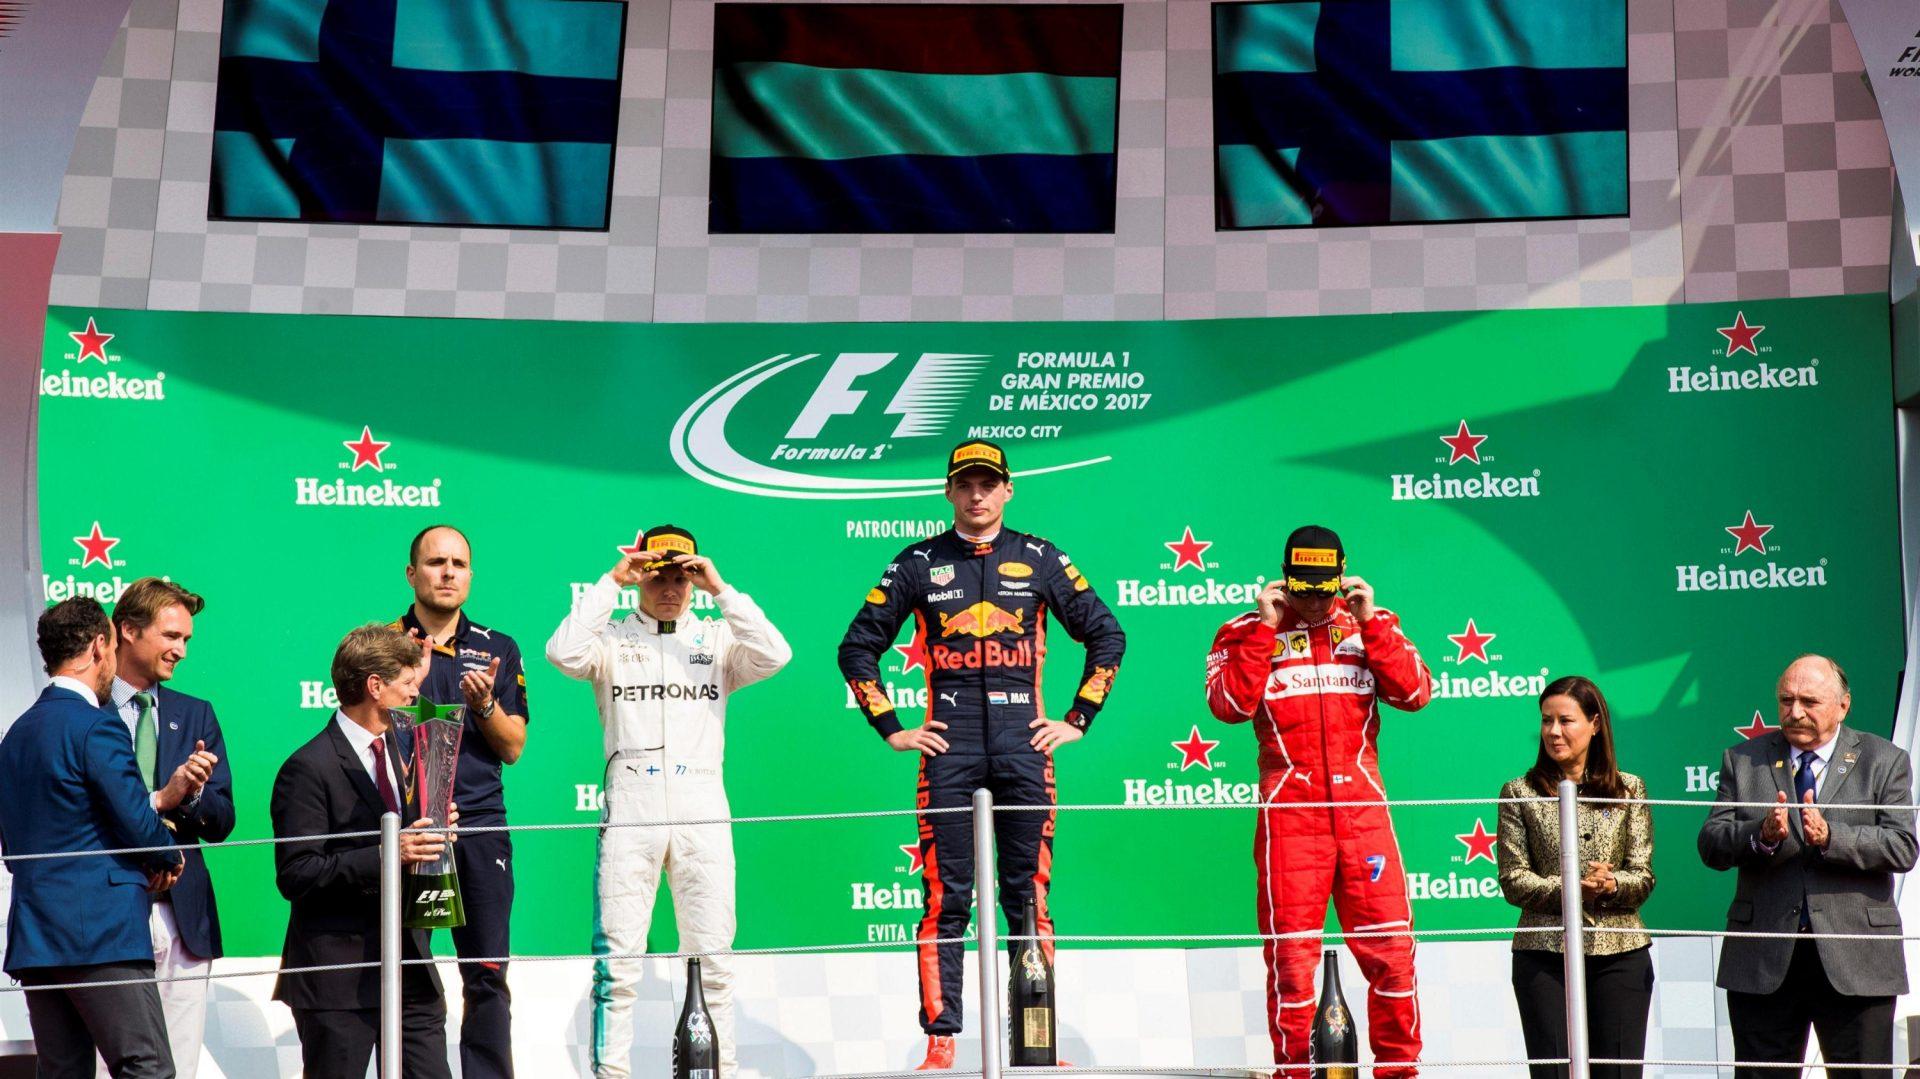 ganadores formula 1 mexico 2017